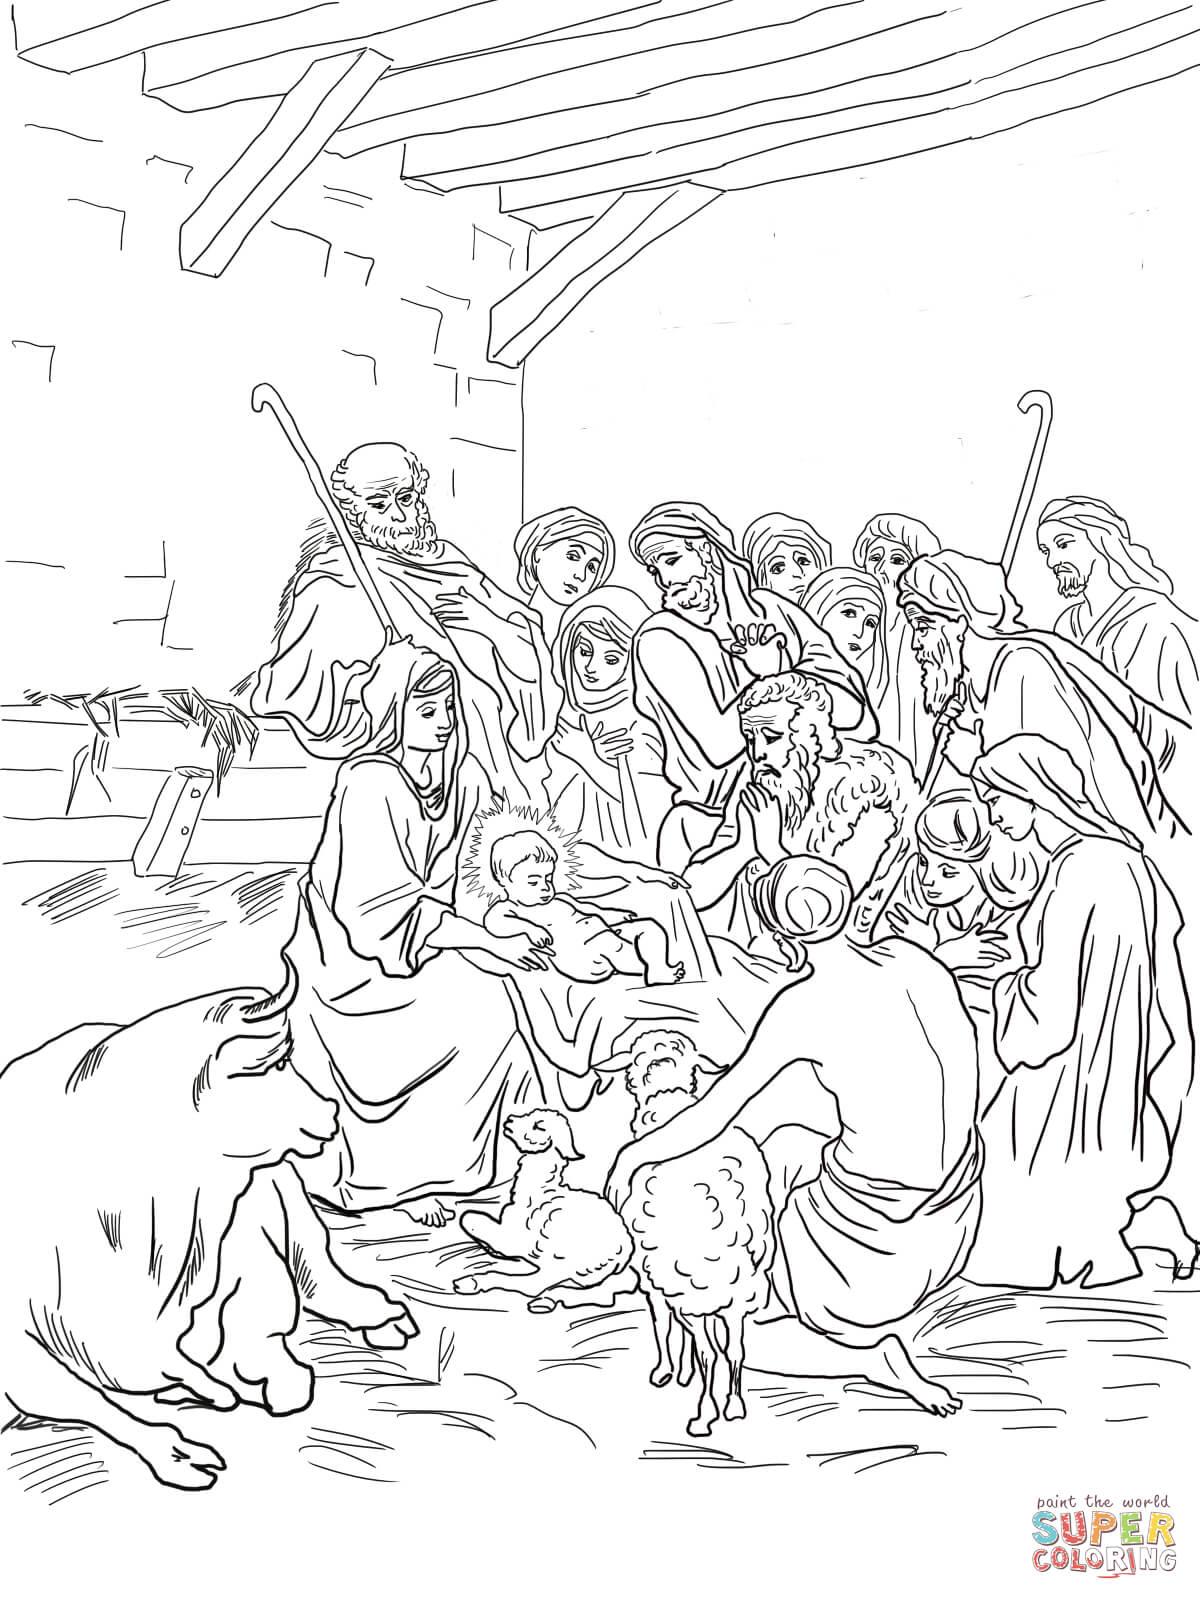 Nativity Scene With Holy Family Shepherds And Animals